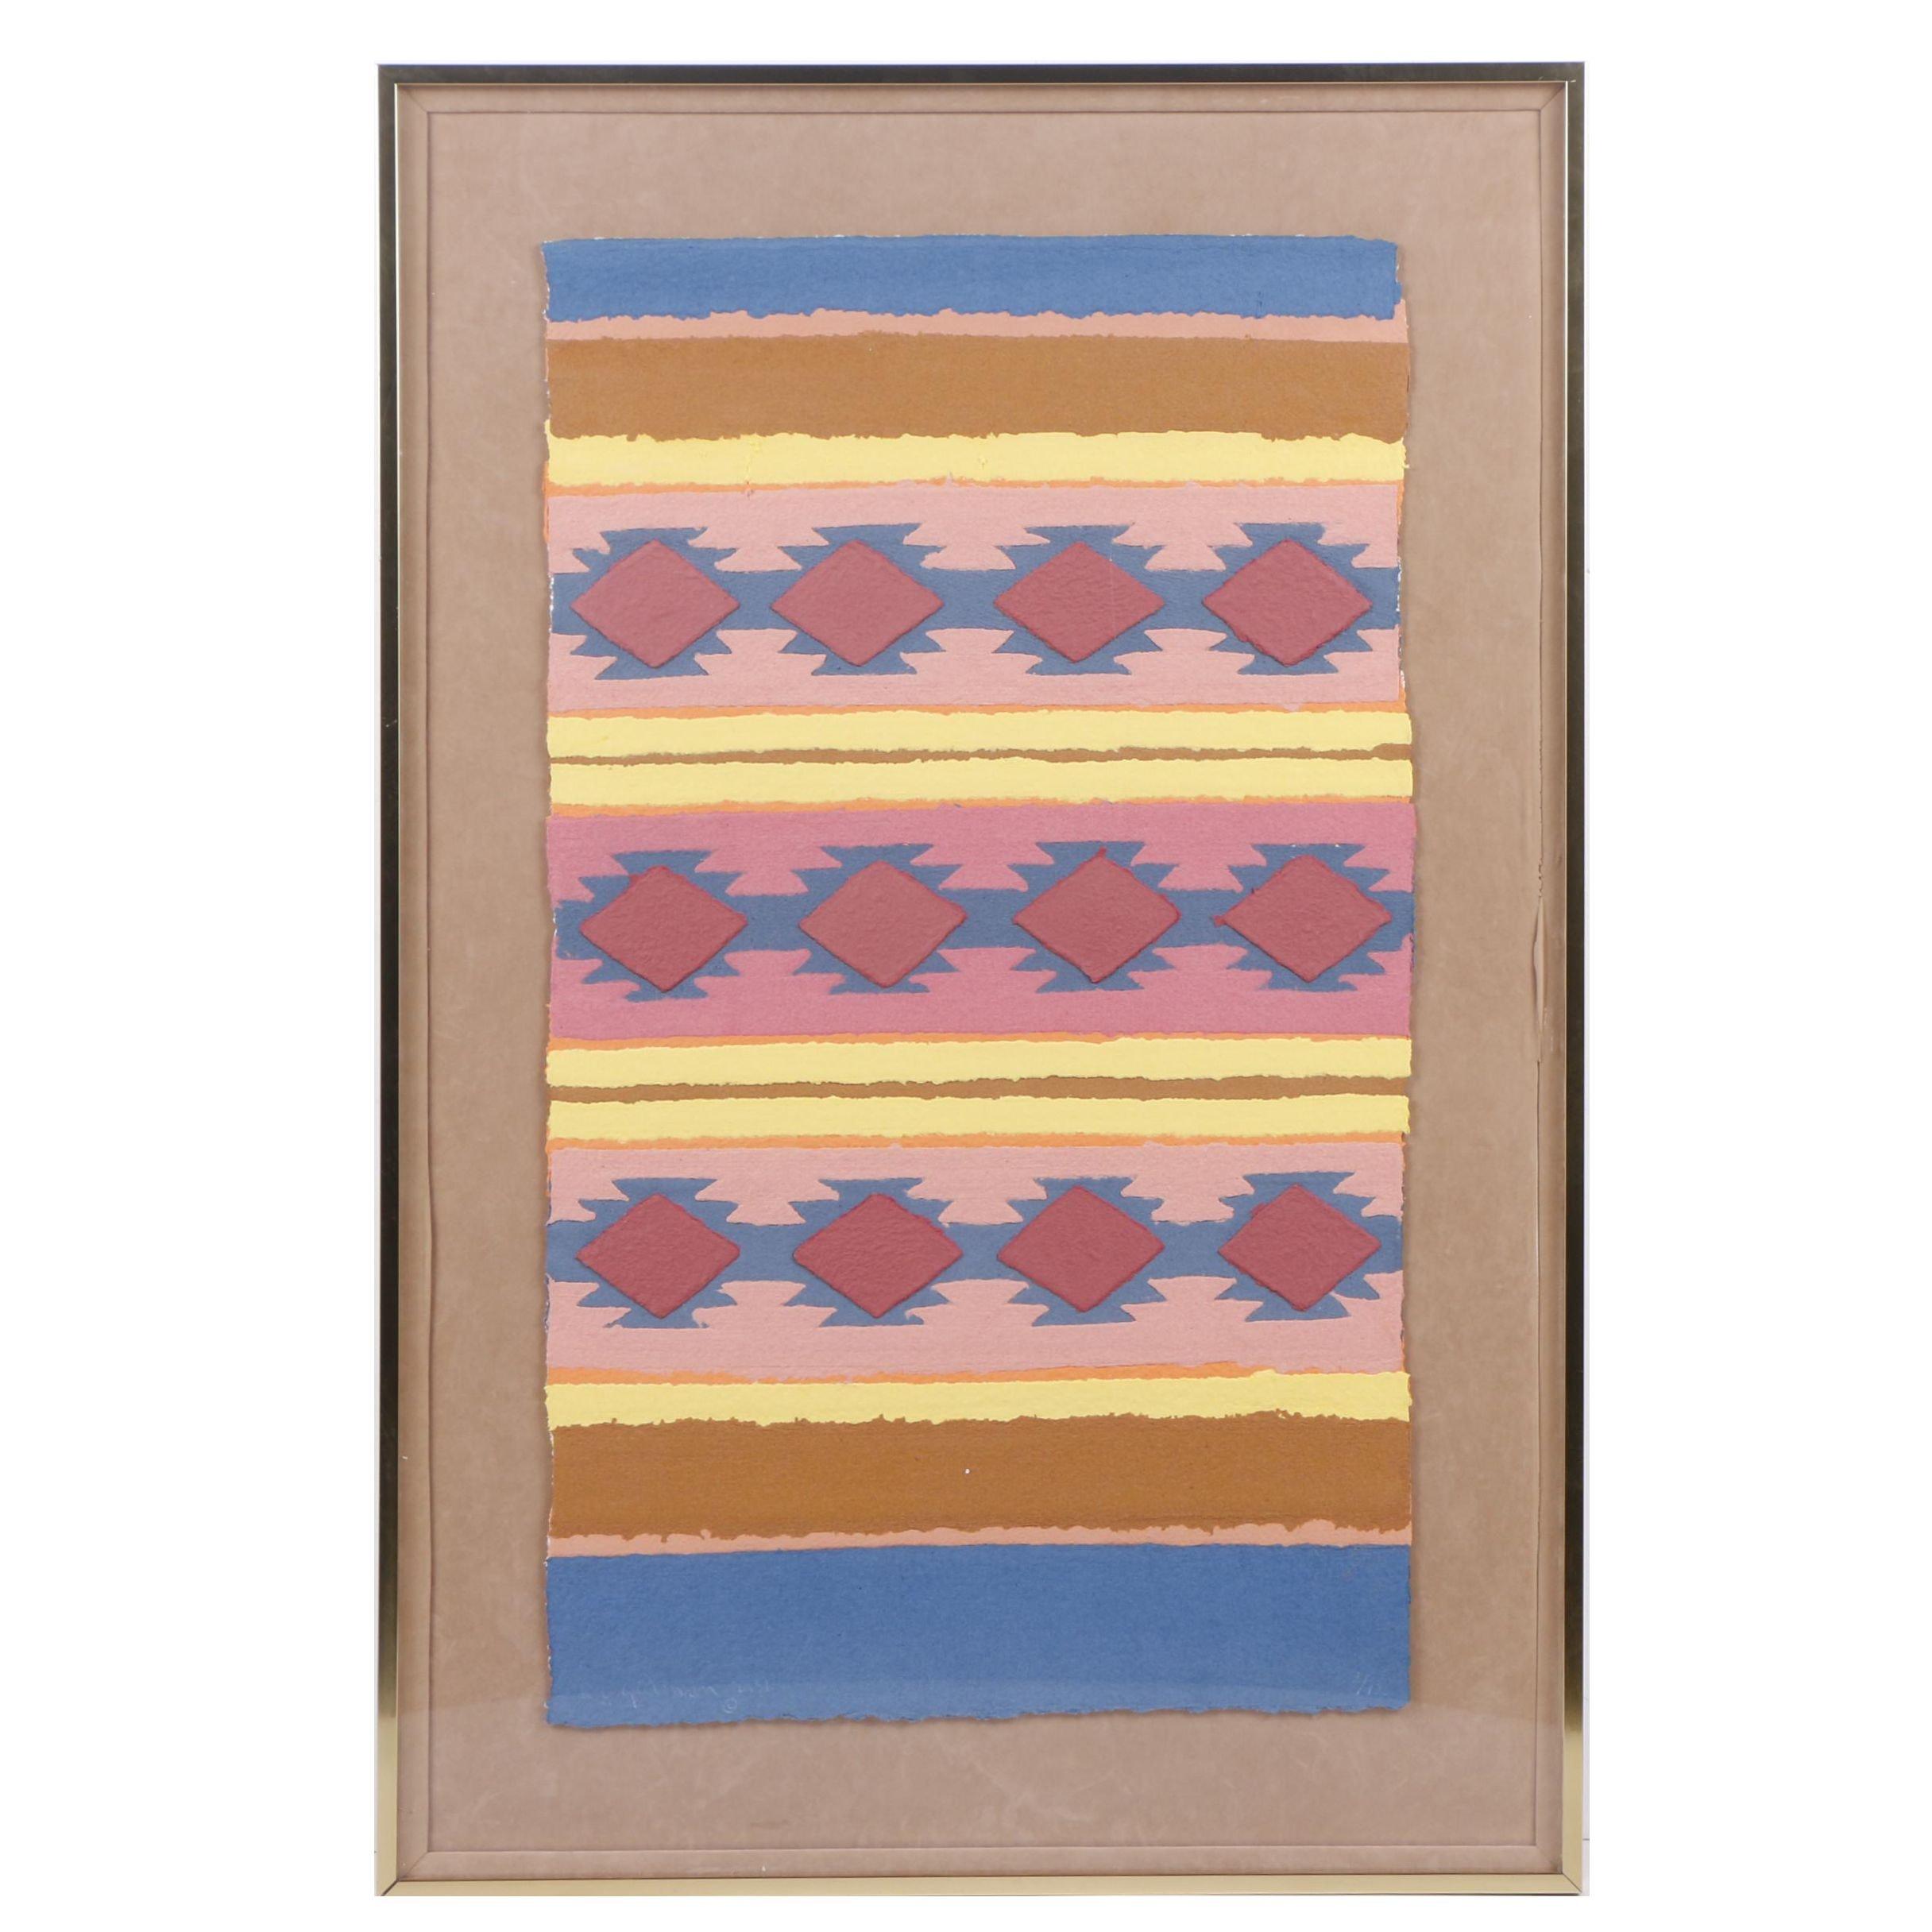 1981 Rudolph Carl Gorman Paper Collage